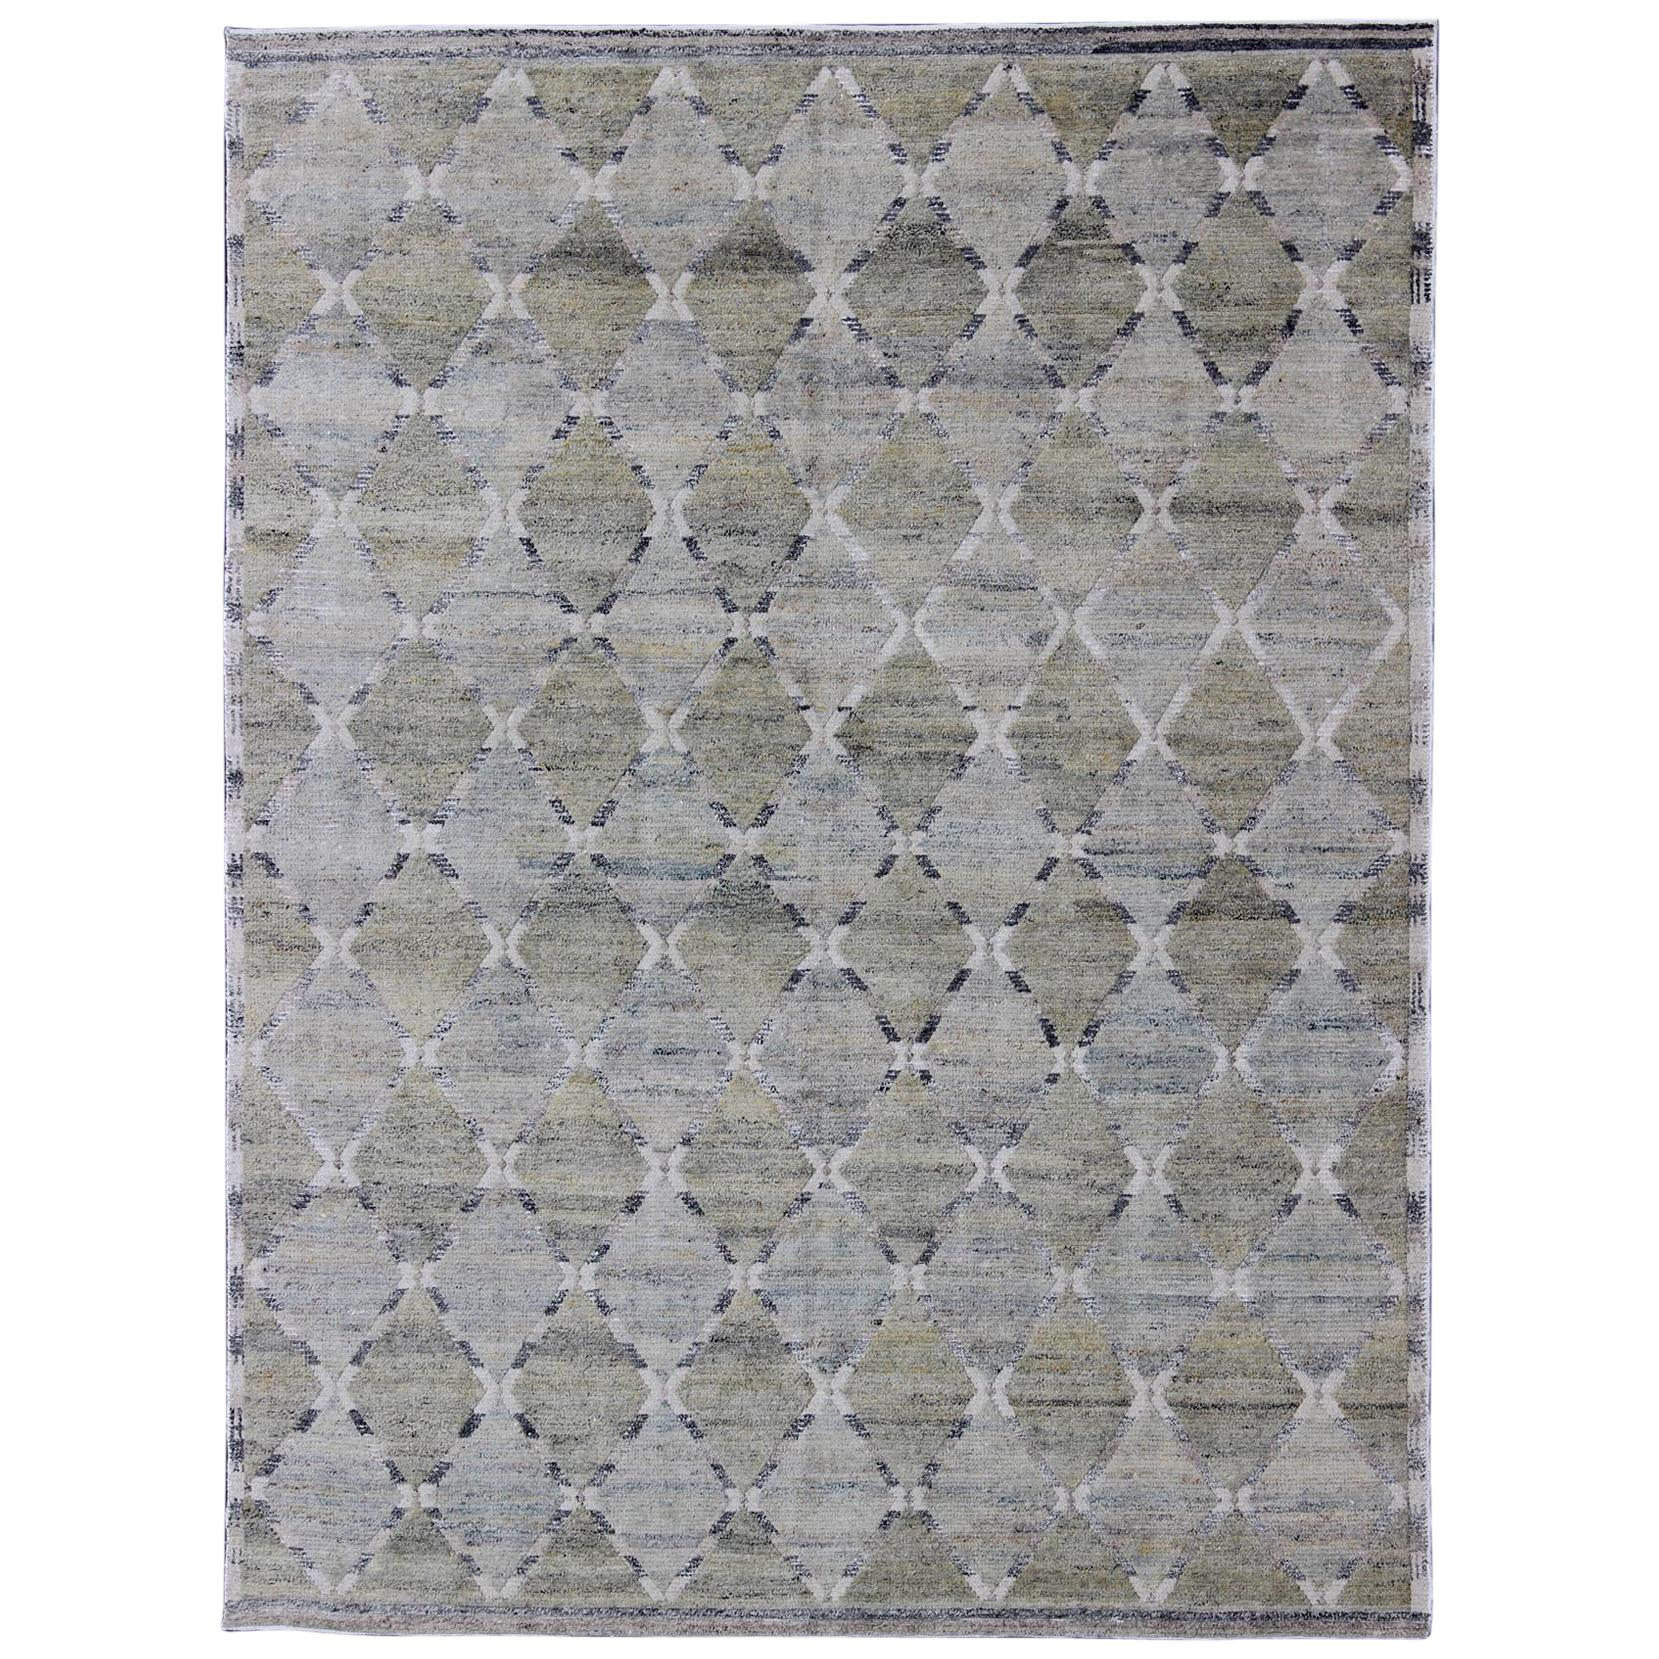 Geometric Latticework Pattern Modern Scandinavian Piled Rug in Shades of Gray